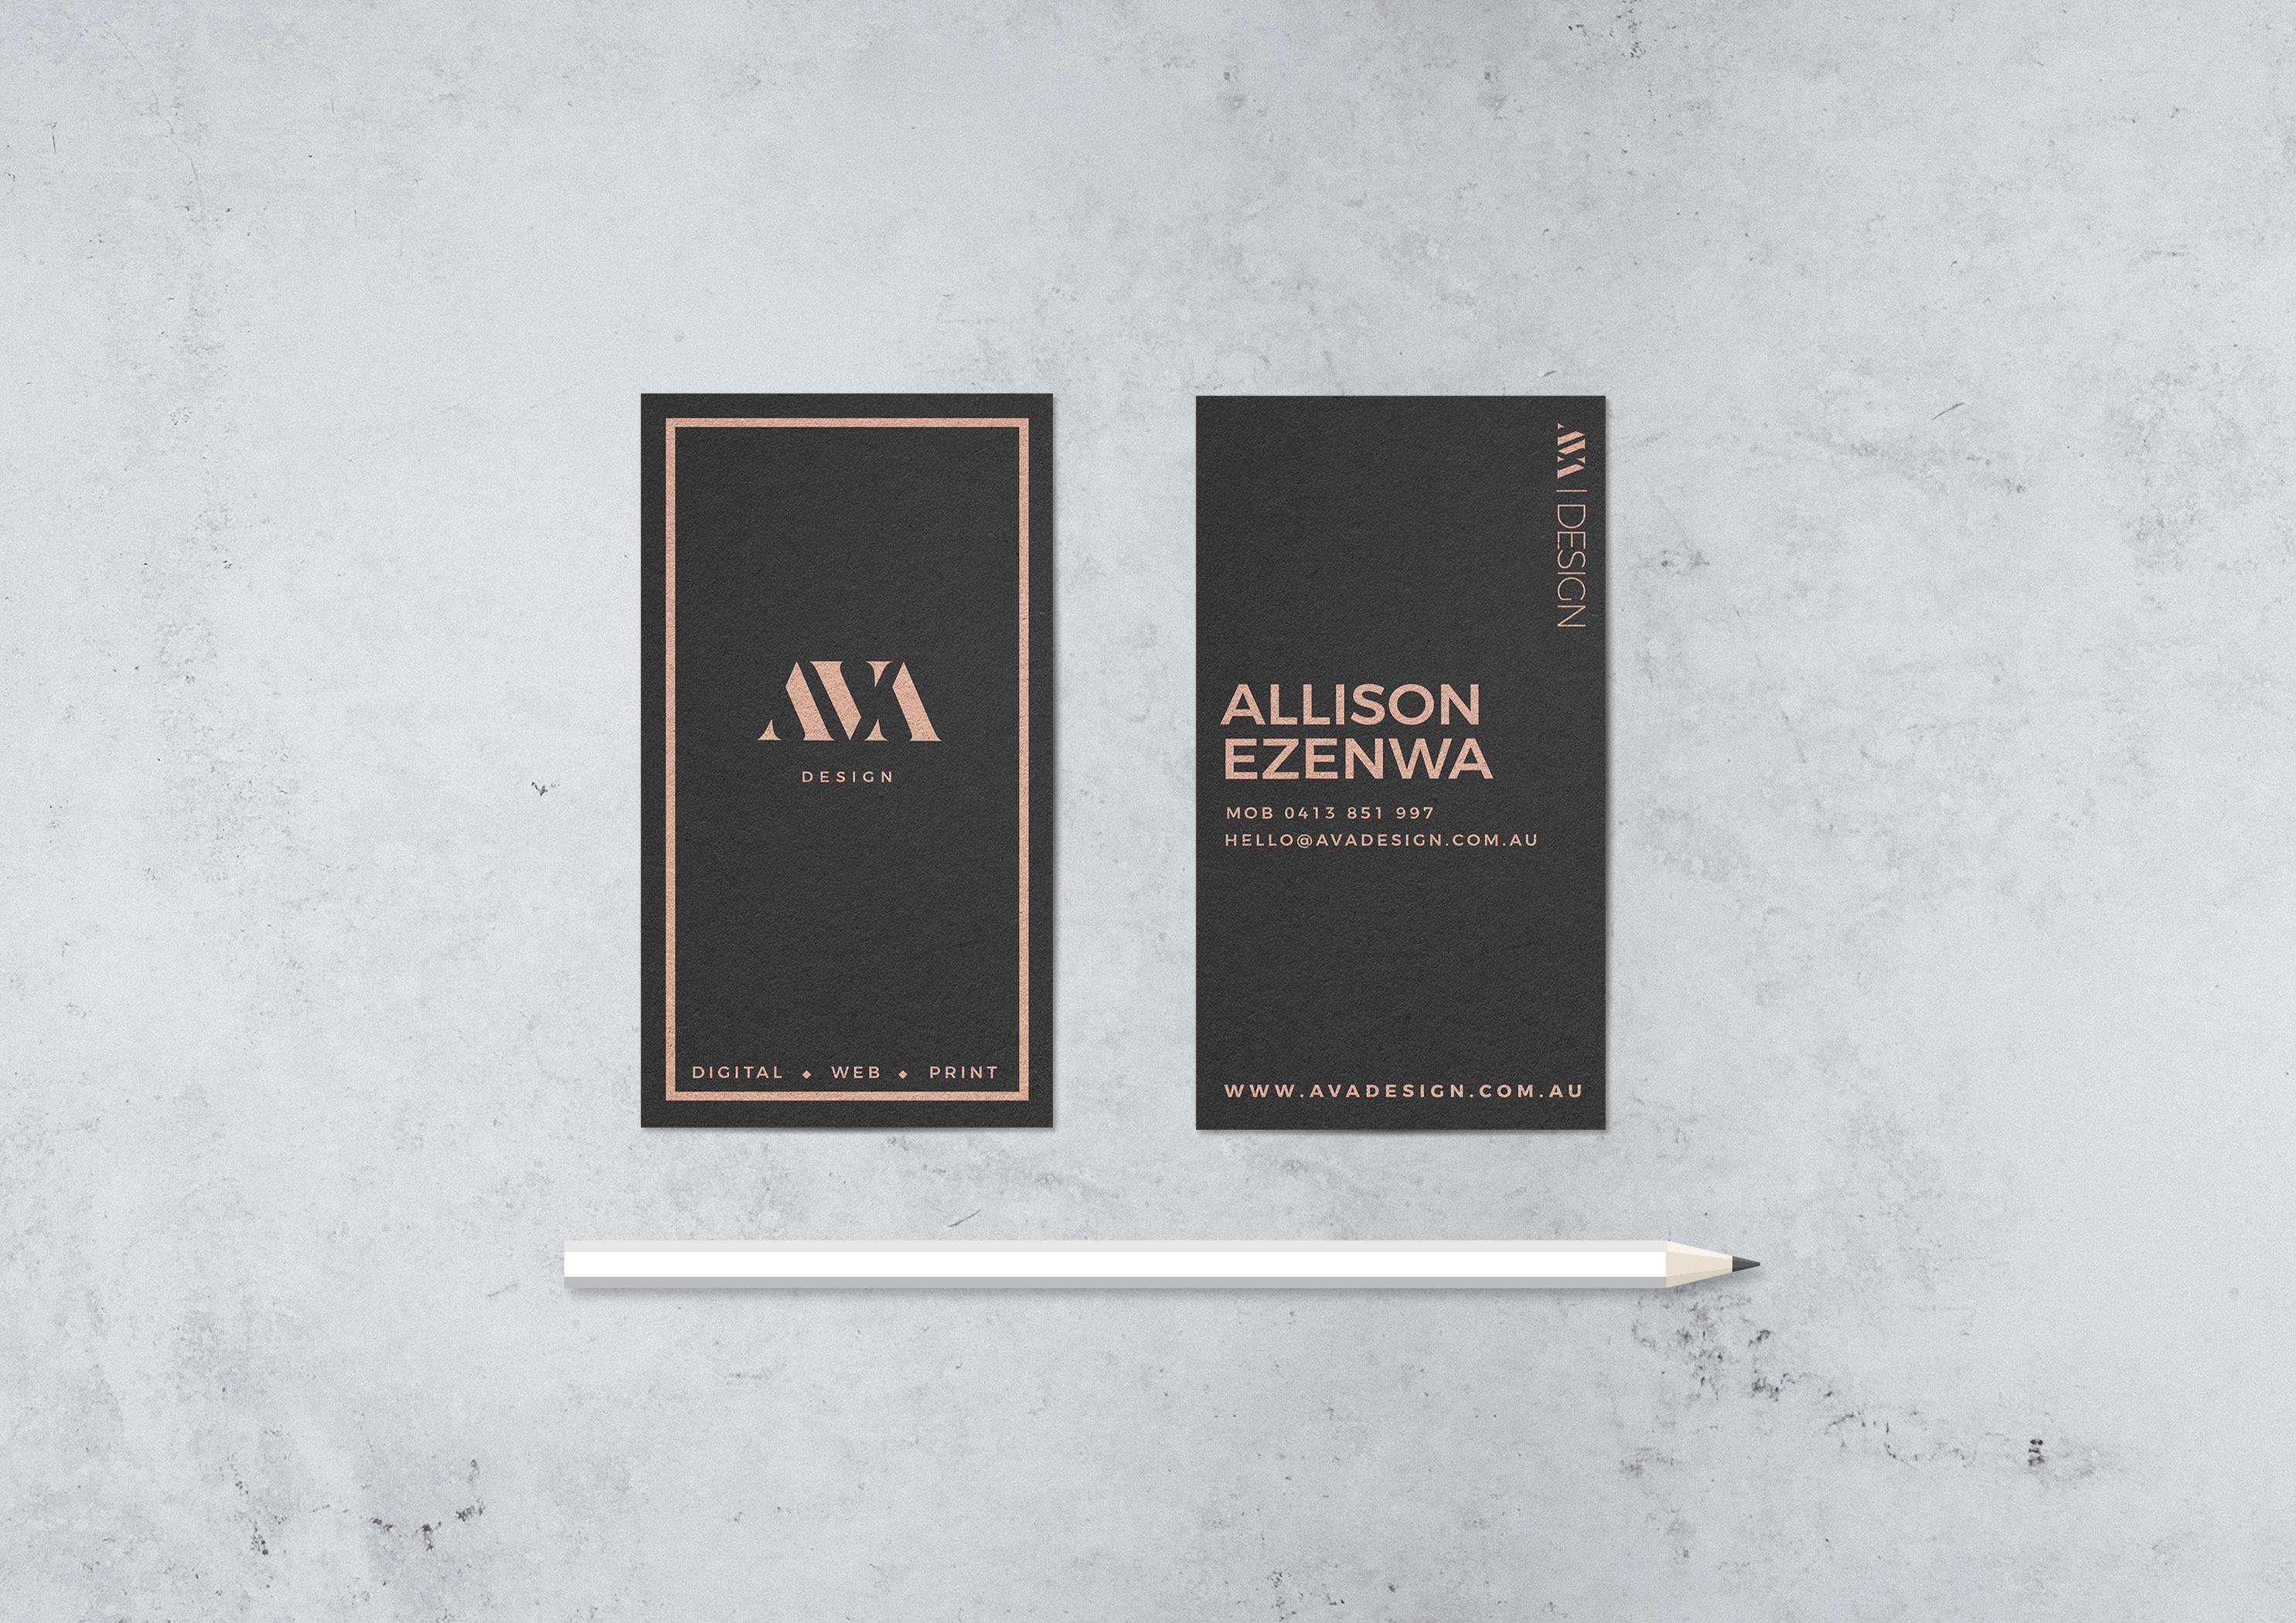 AVA Design Business cards